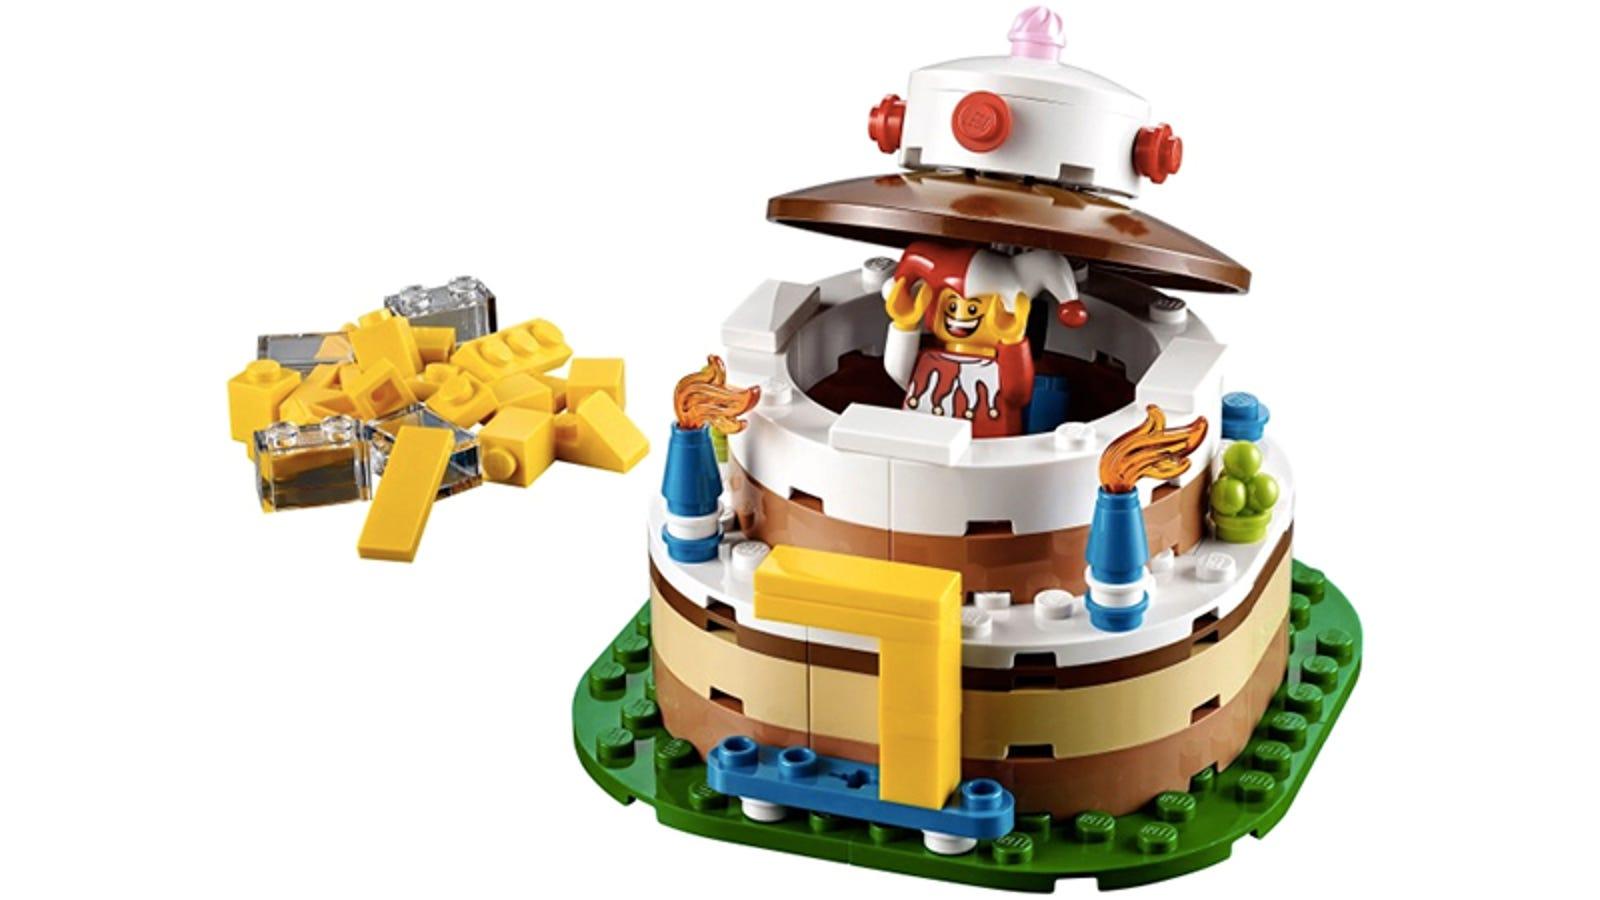 Legos New Birthday Cake Set Is A Calorie Free Way To Celebrate